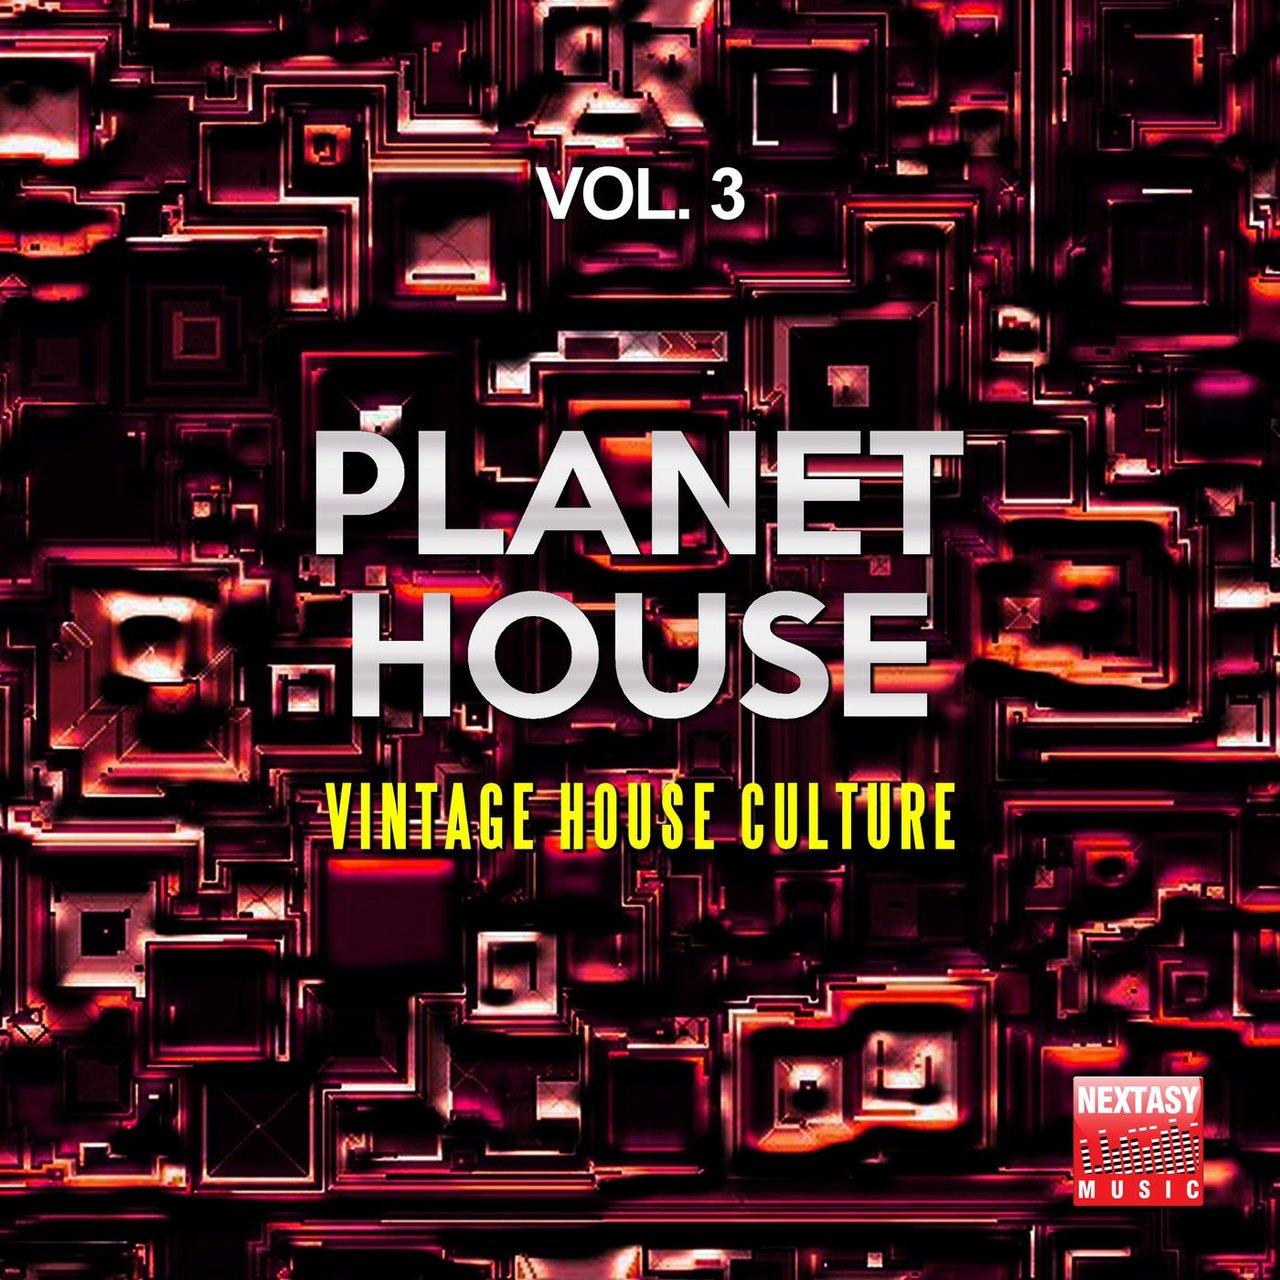 Planet House, Vol  3 (Vintage House Culture) by Sugar Freak on TIDAL